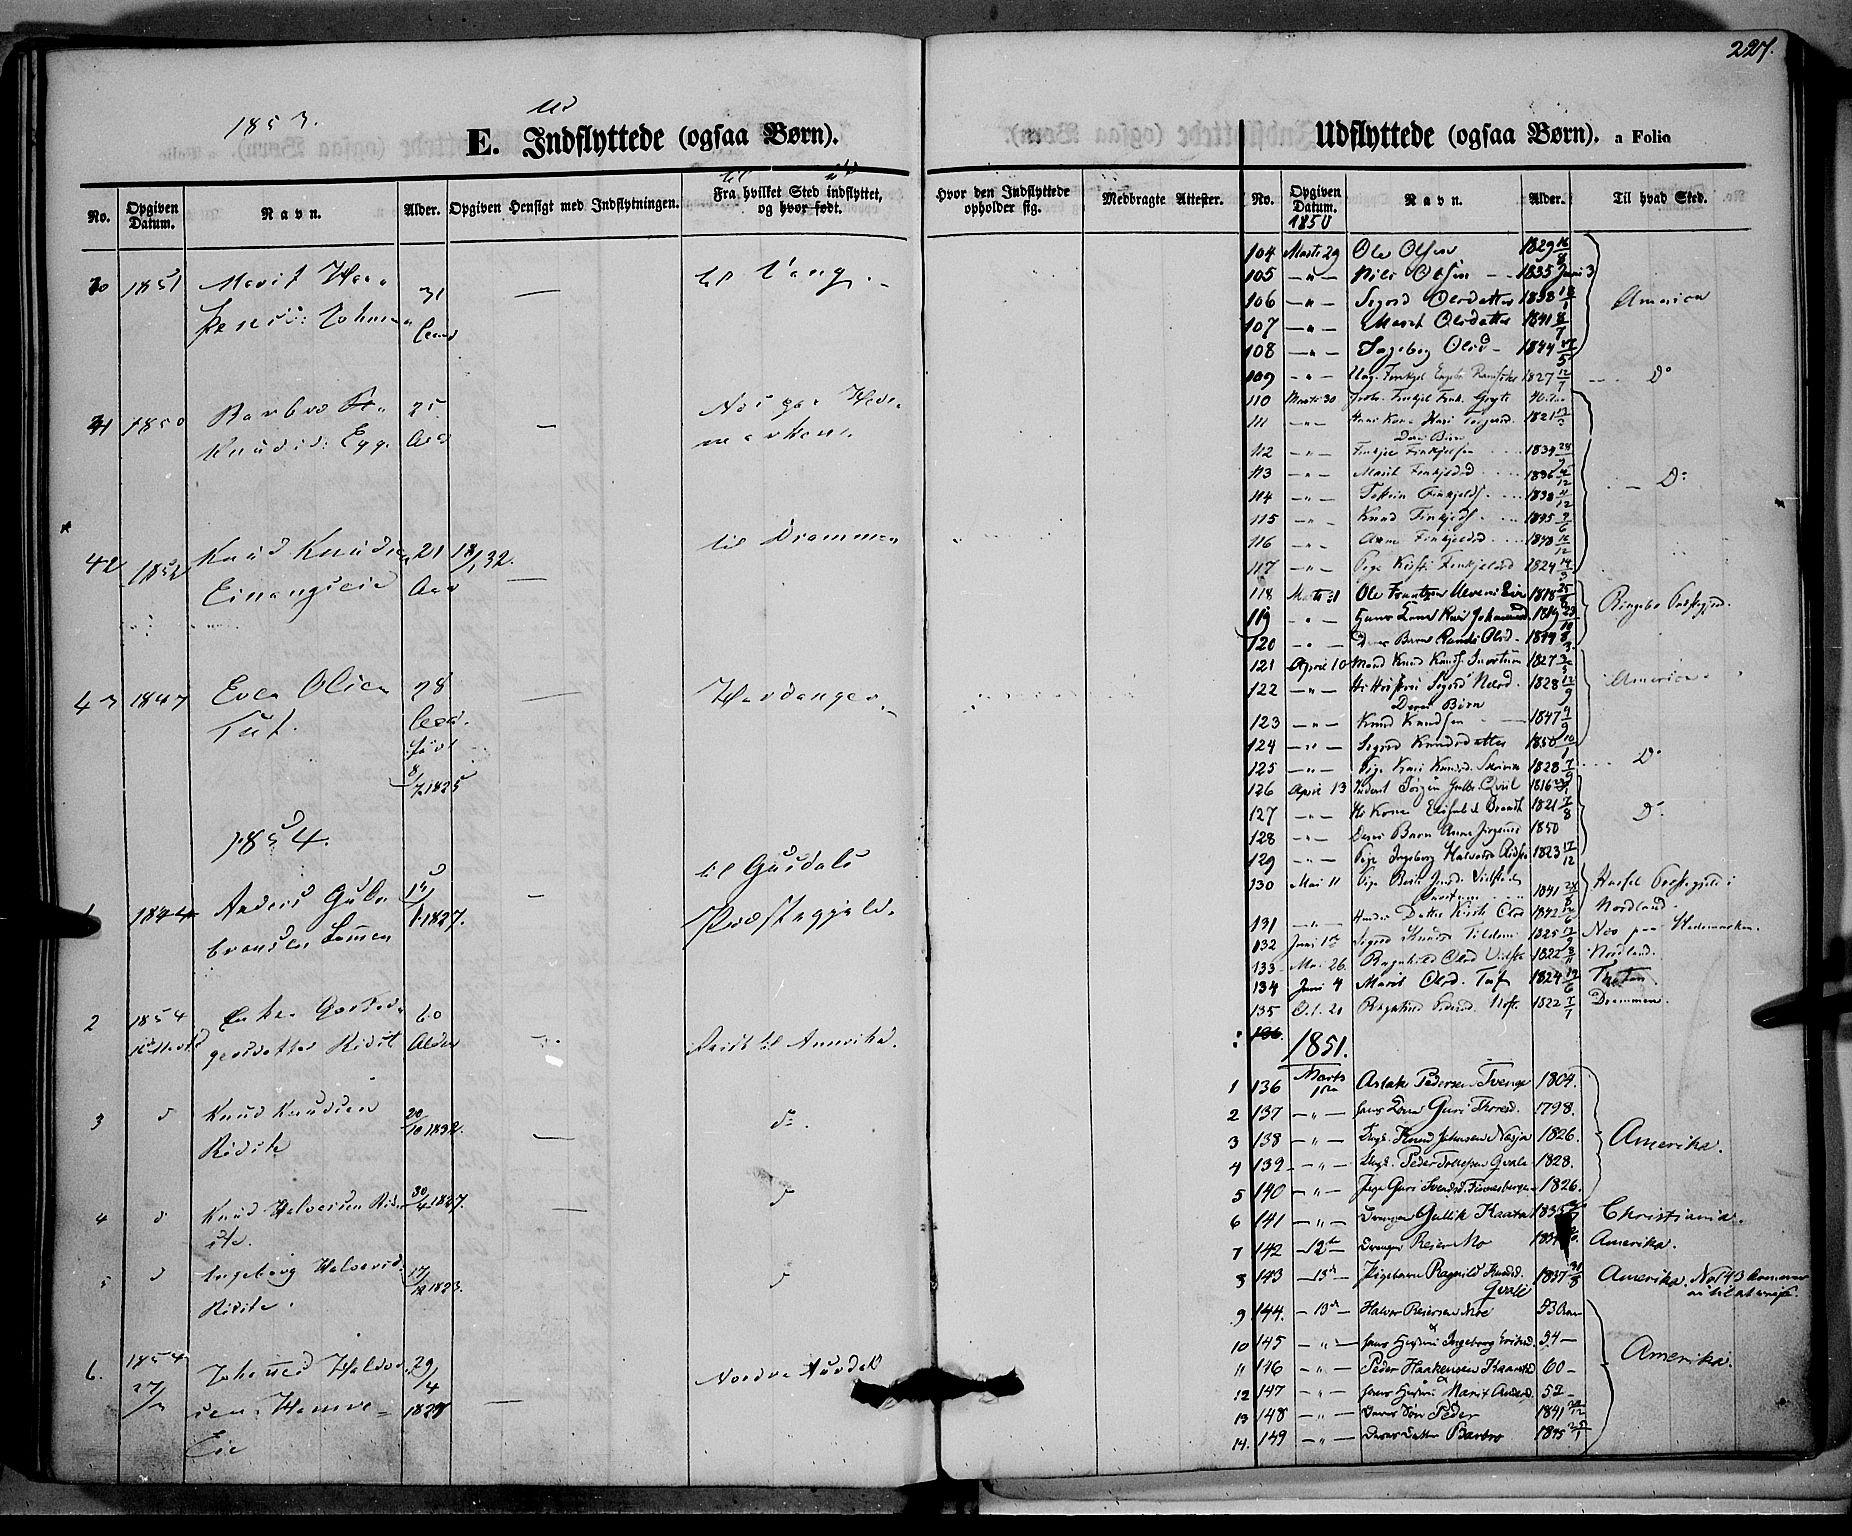 SAH, Vestre Slidre prestekontor, Ministerialbok nr. 1, 1844-1855, s. 227